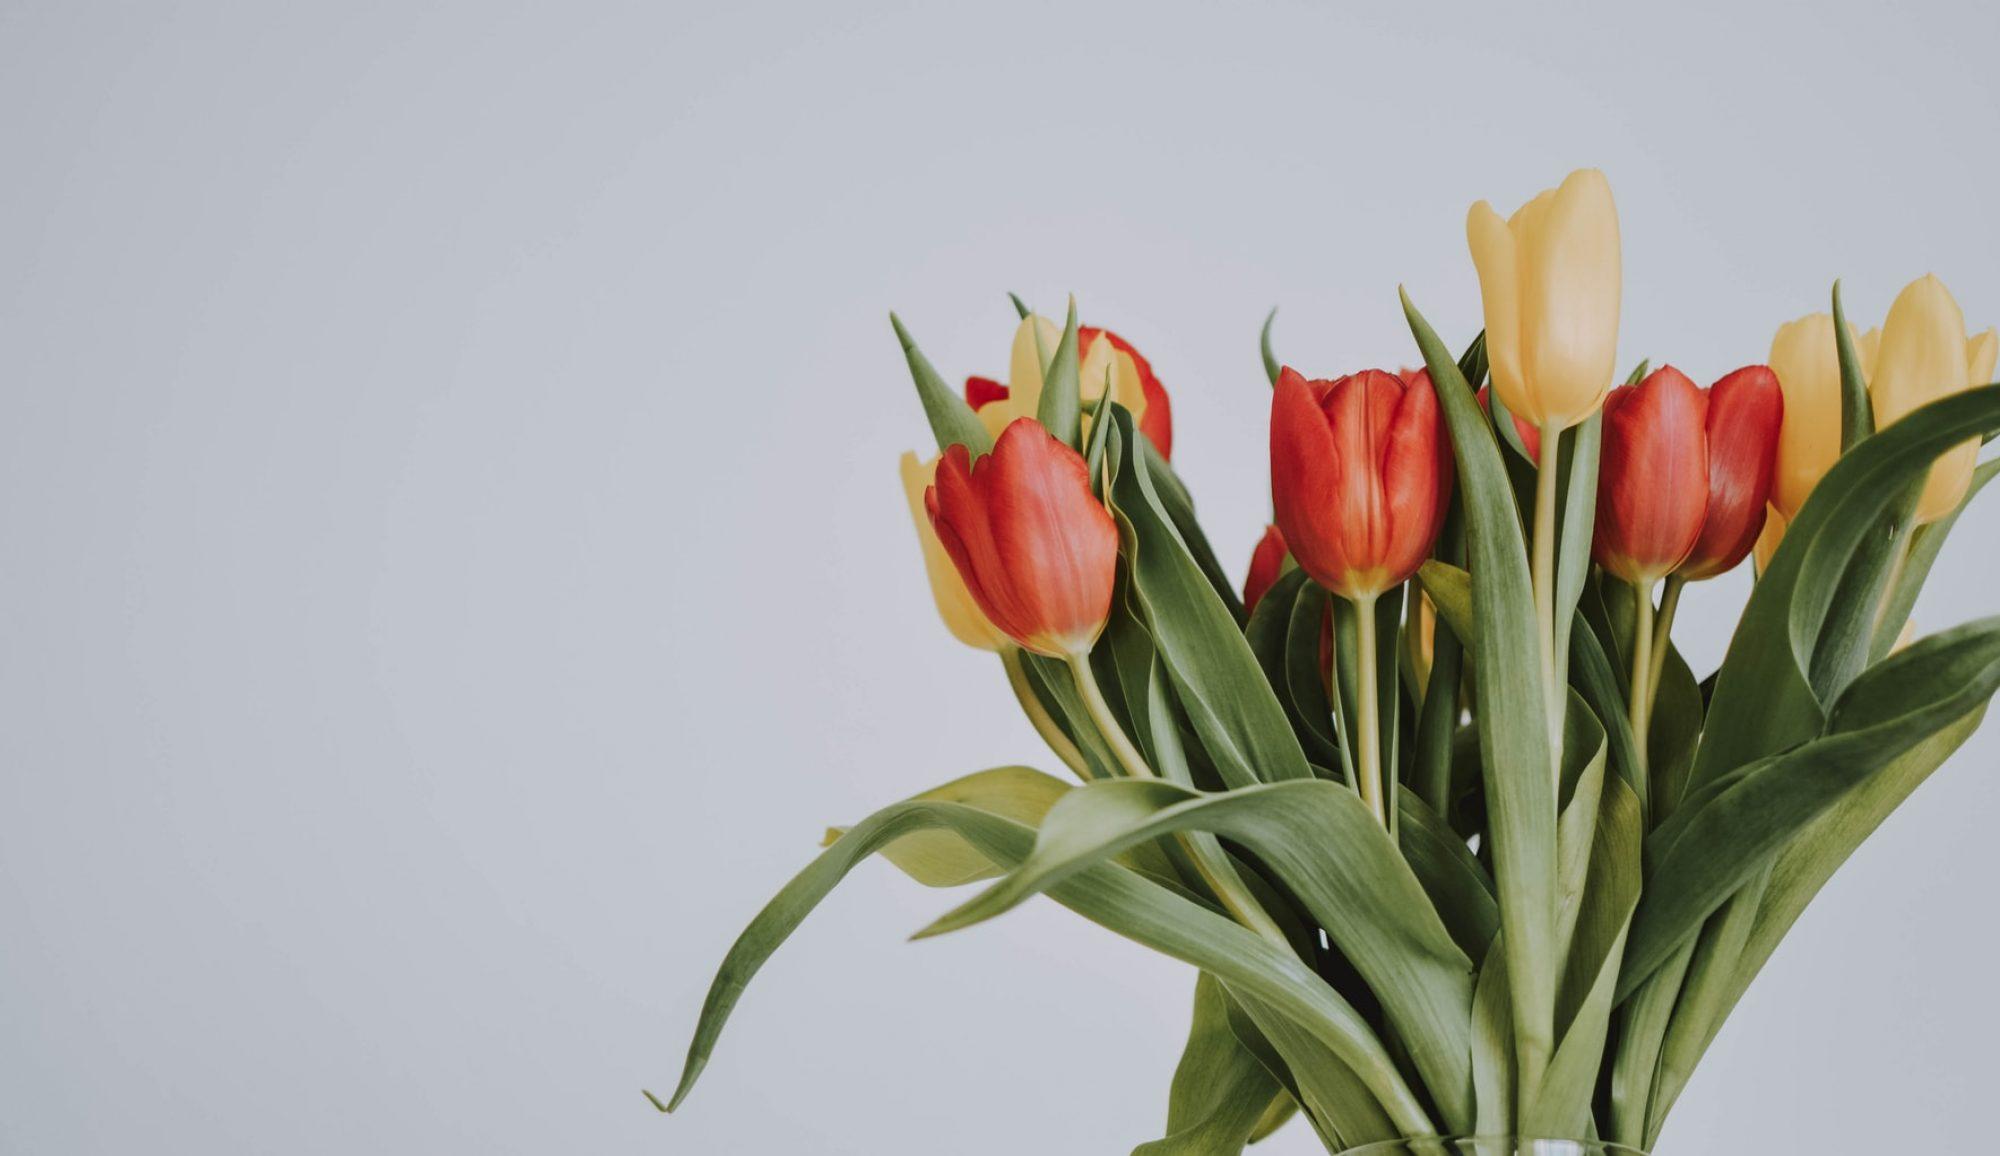 Tulip Town Bulb Company